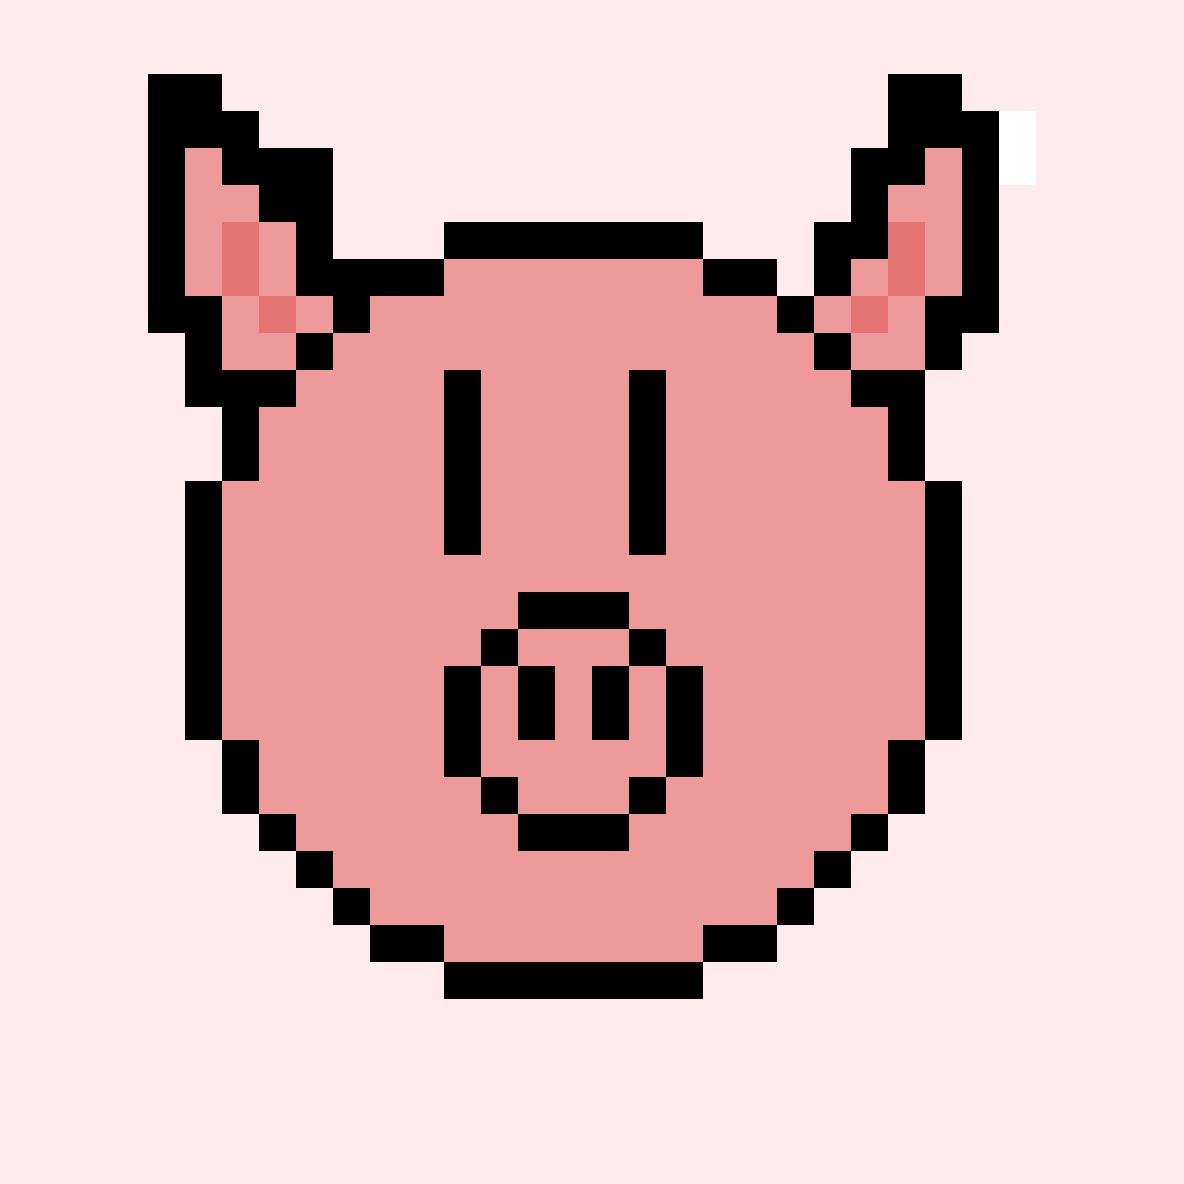 Pig by Dvawsome7